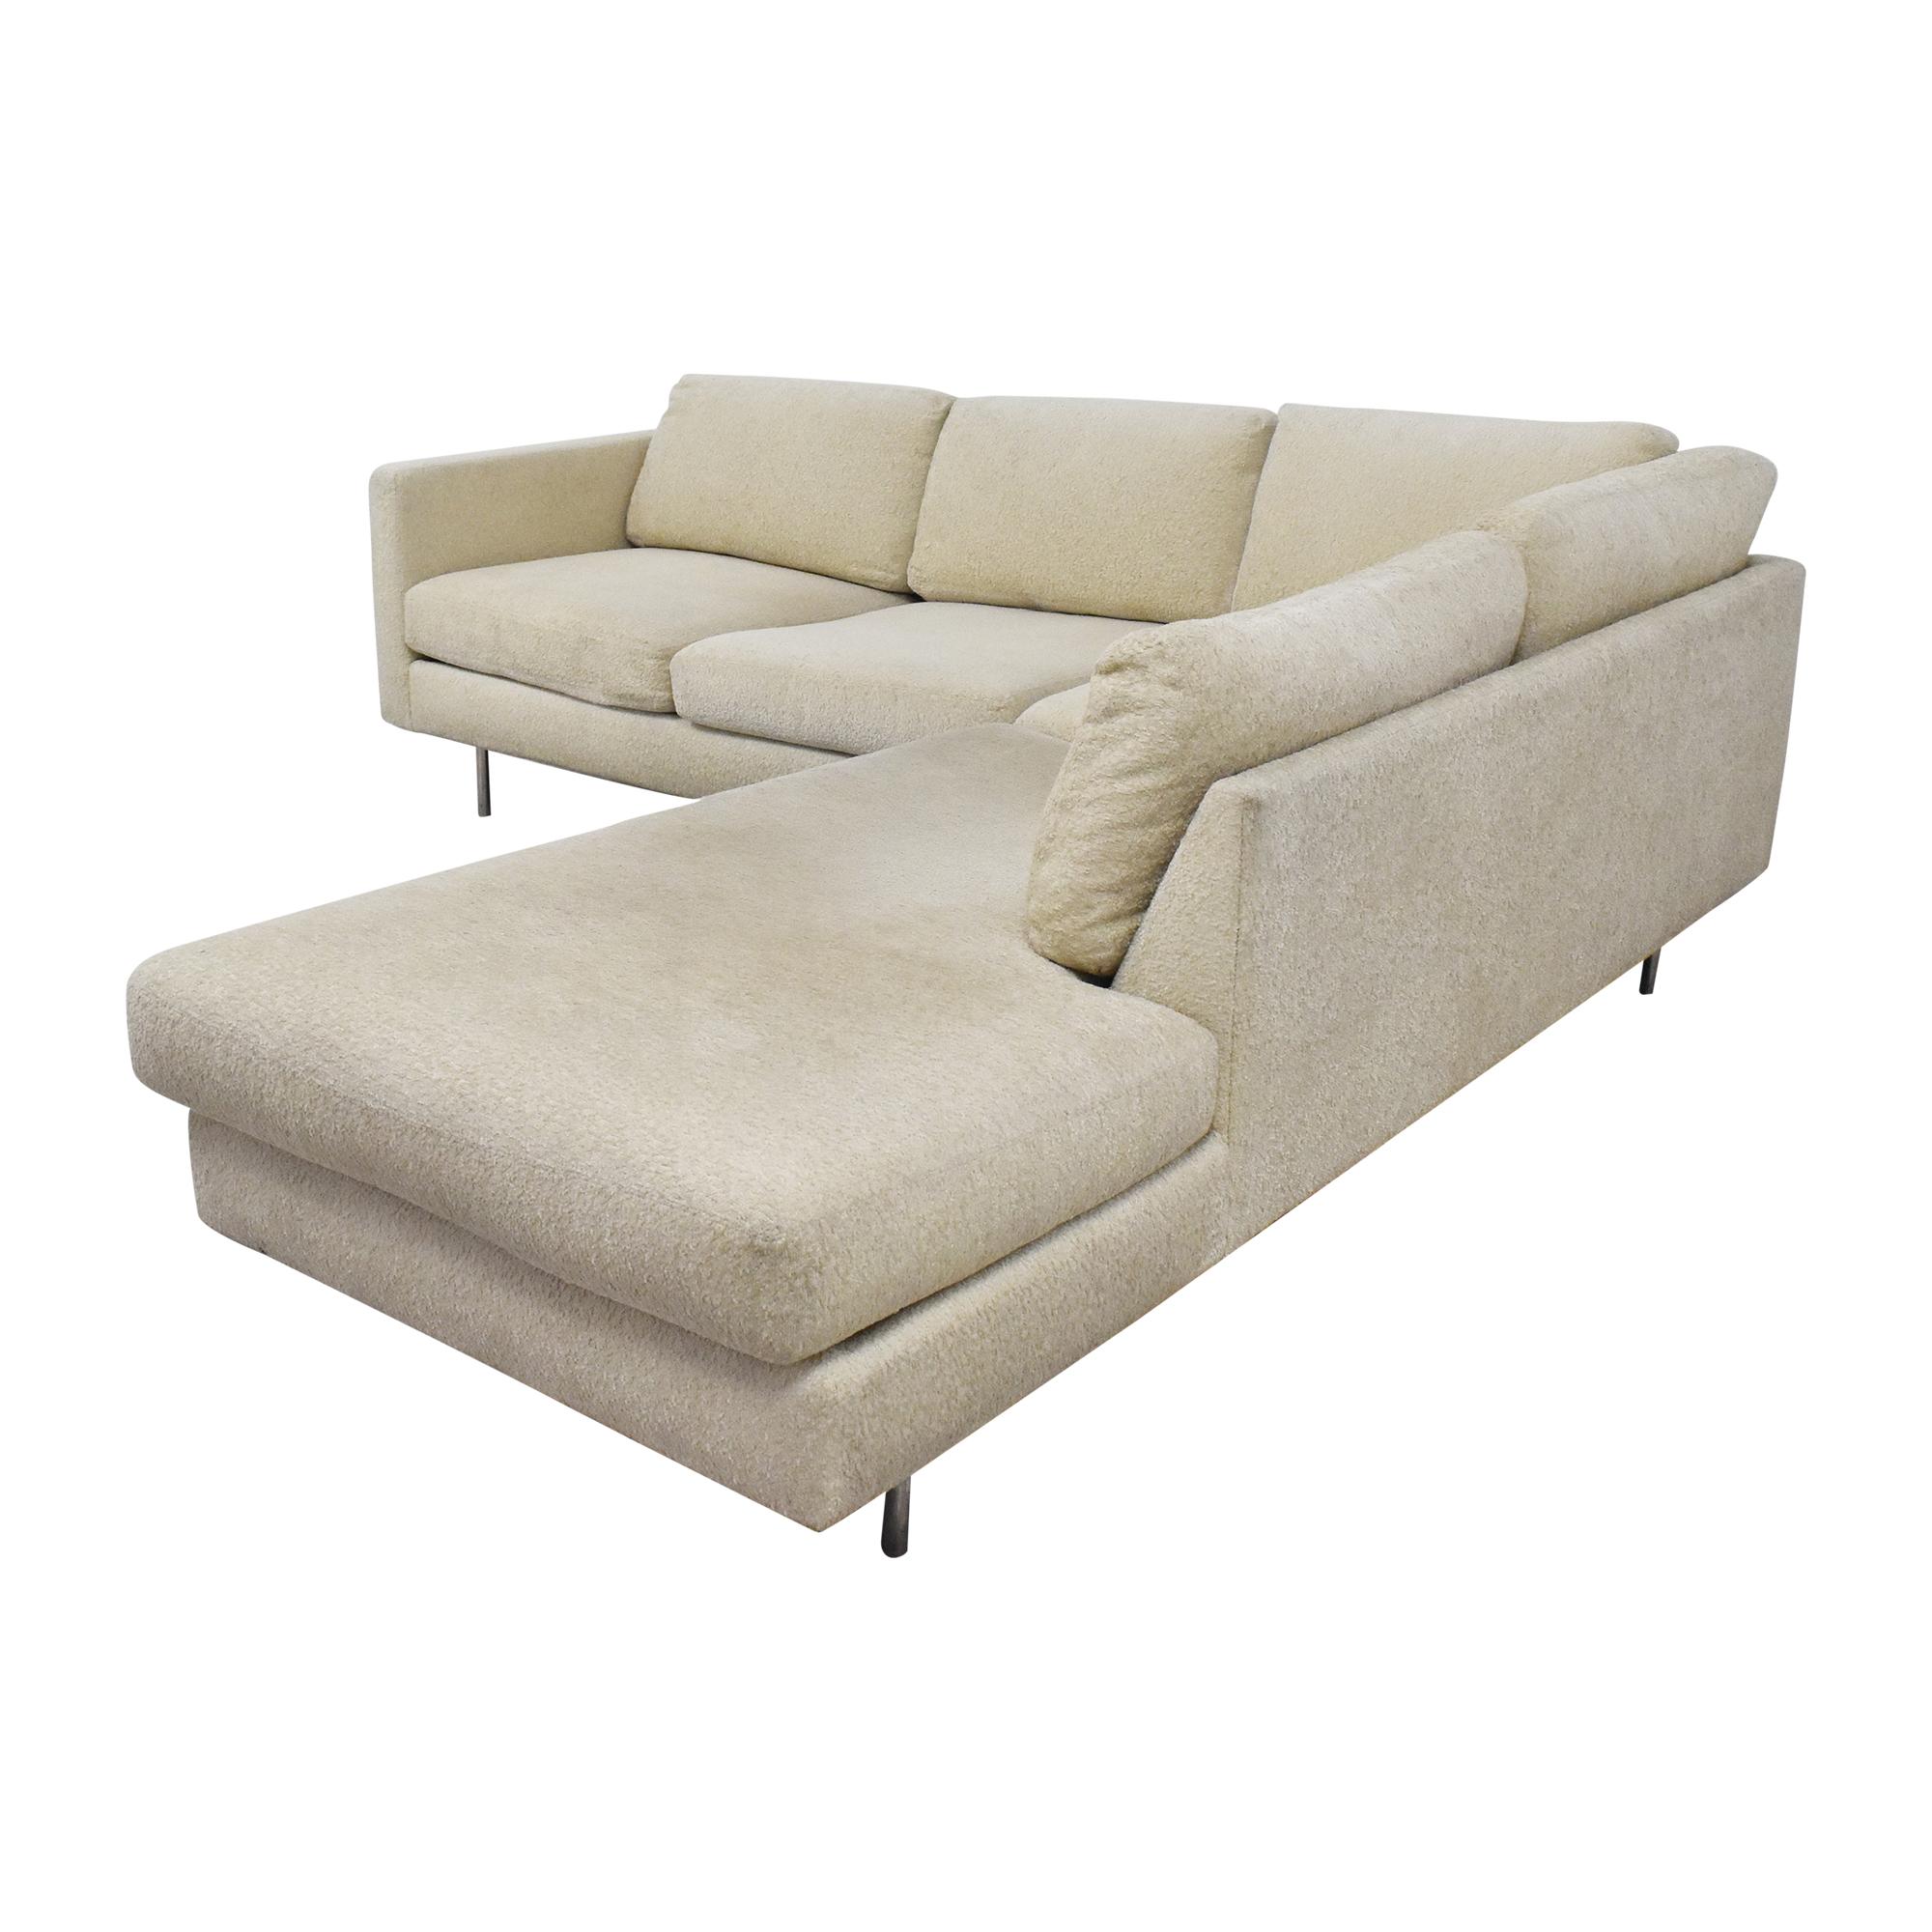 Thayer Coggin Thayer Coggin Milo Baughman Design Classic Sectional Sofa on sale